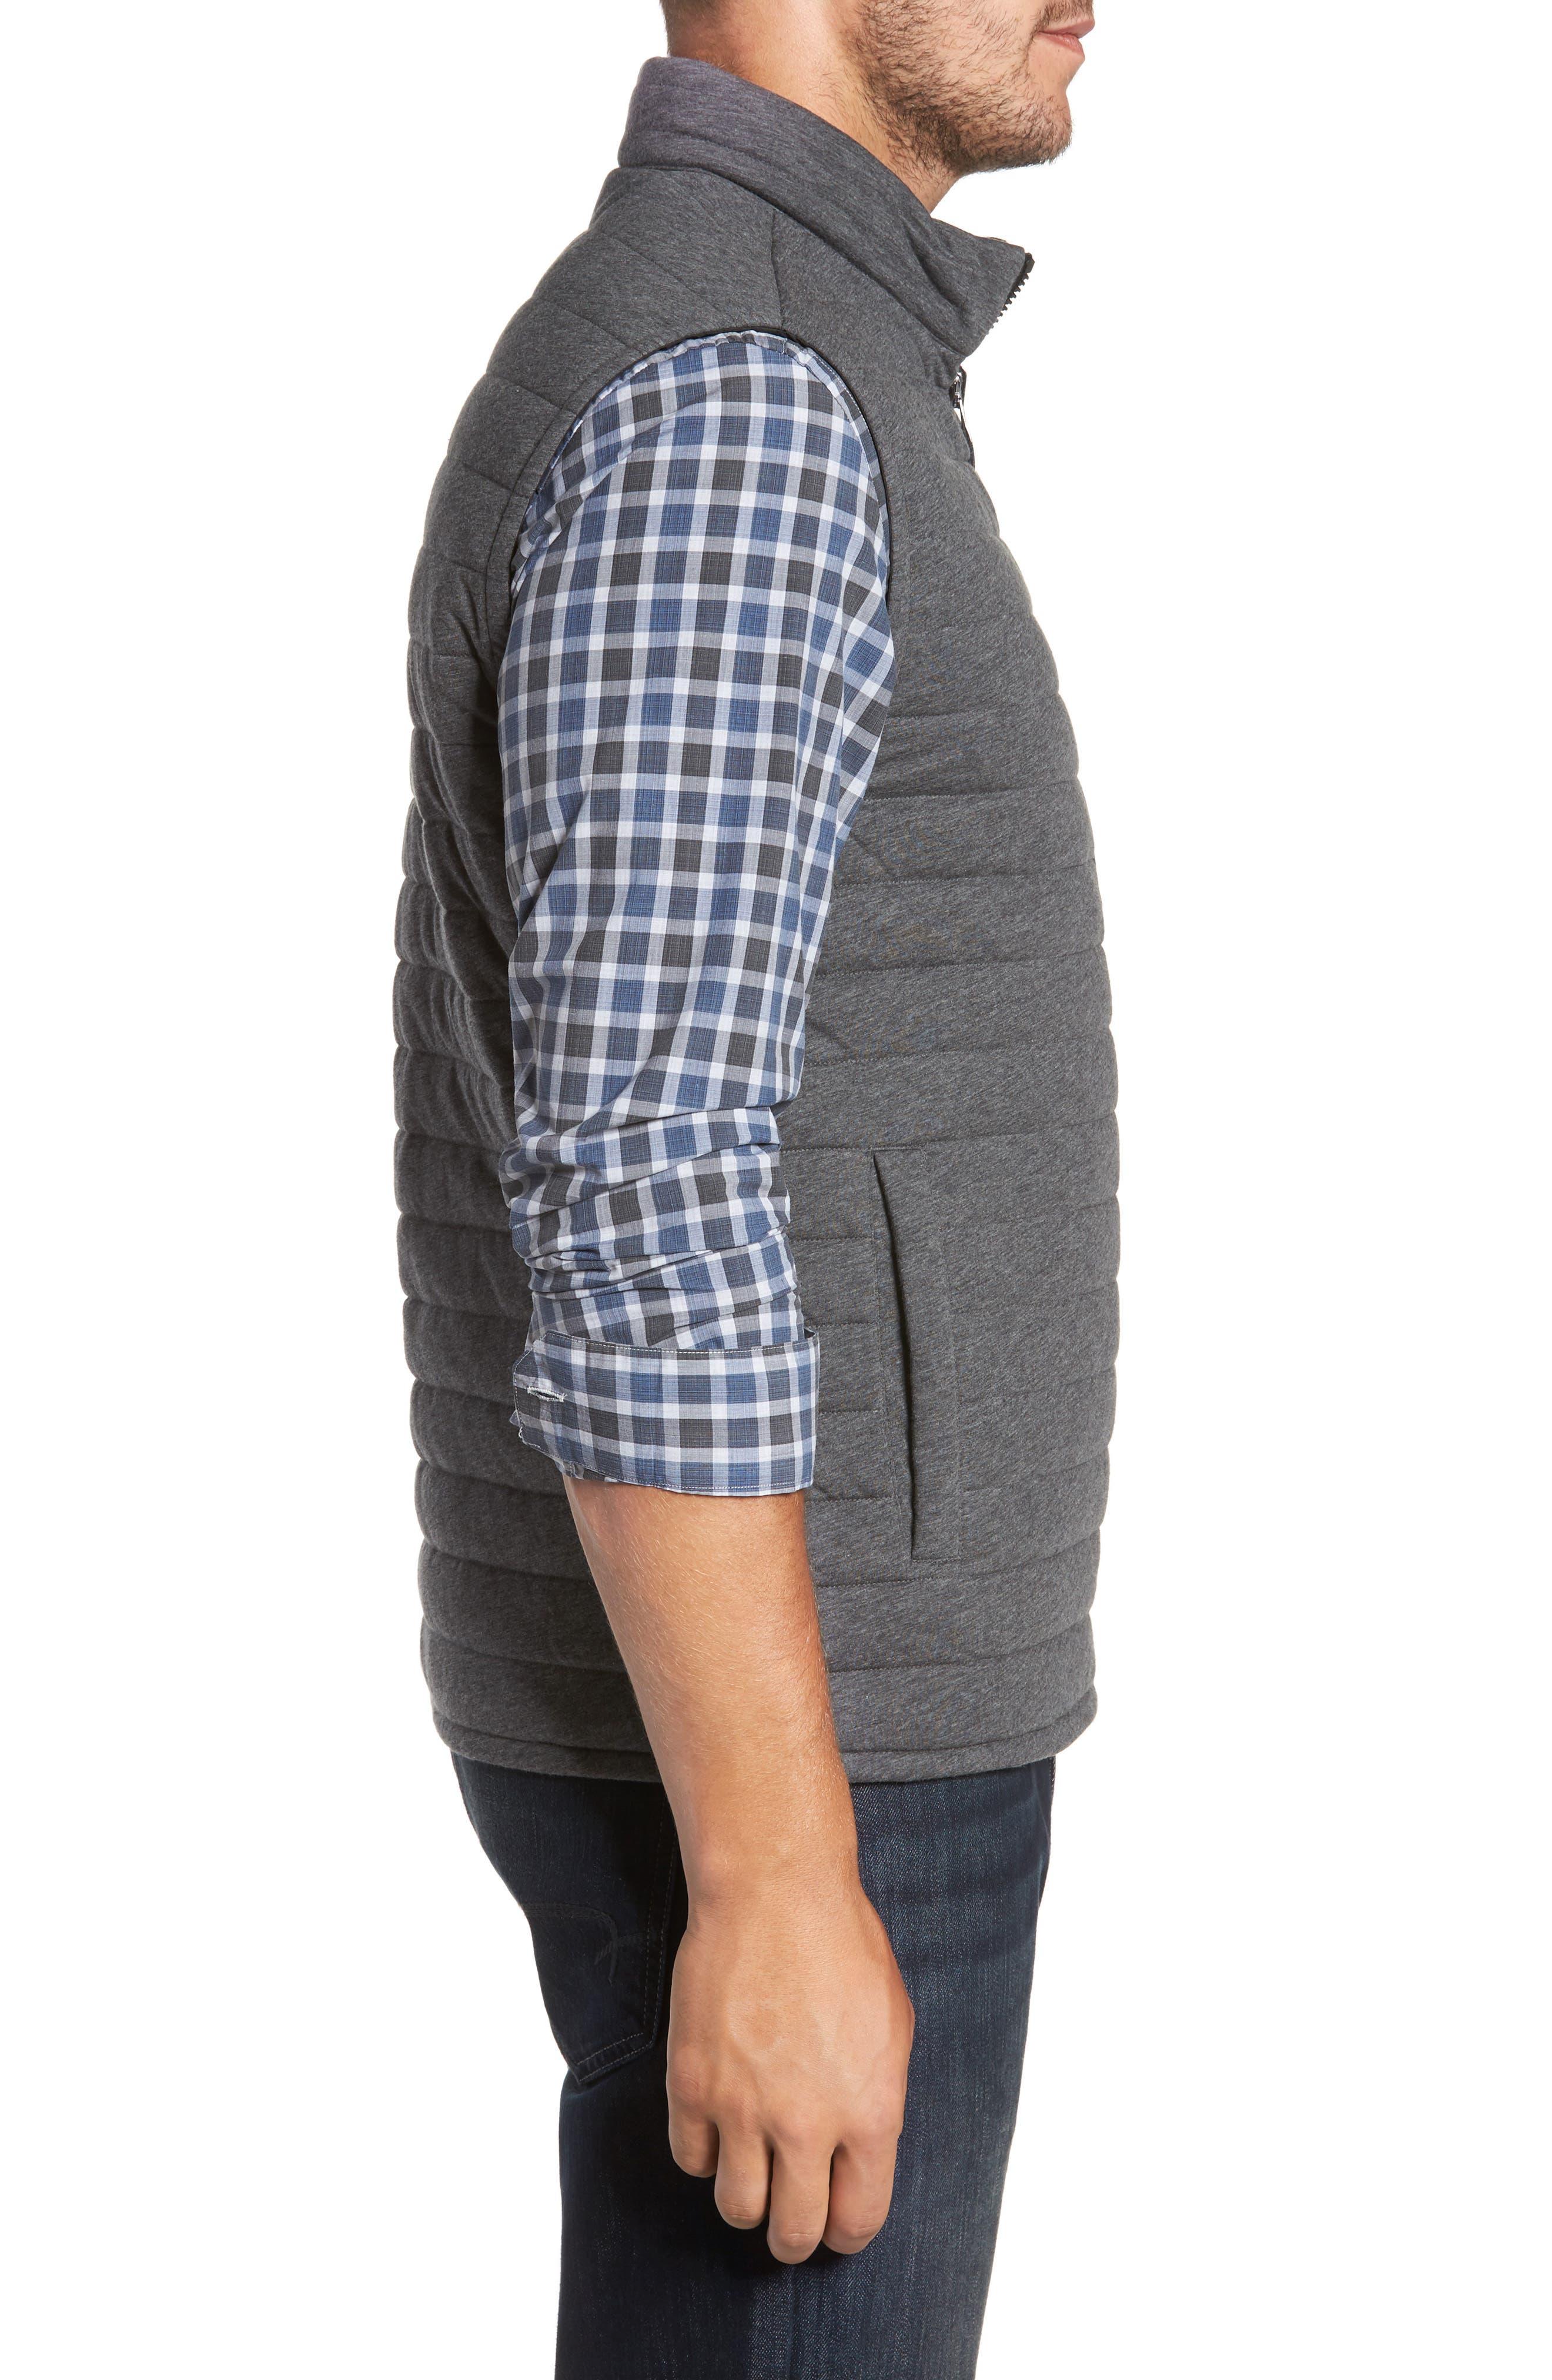 Gallagher Reversible Vest,                             Alternate thumbnail 4, color,                             Charcoal